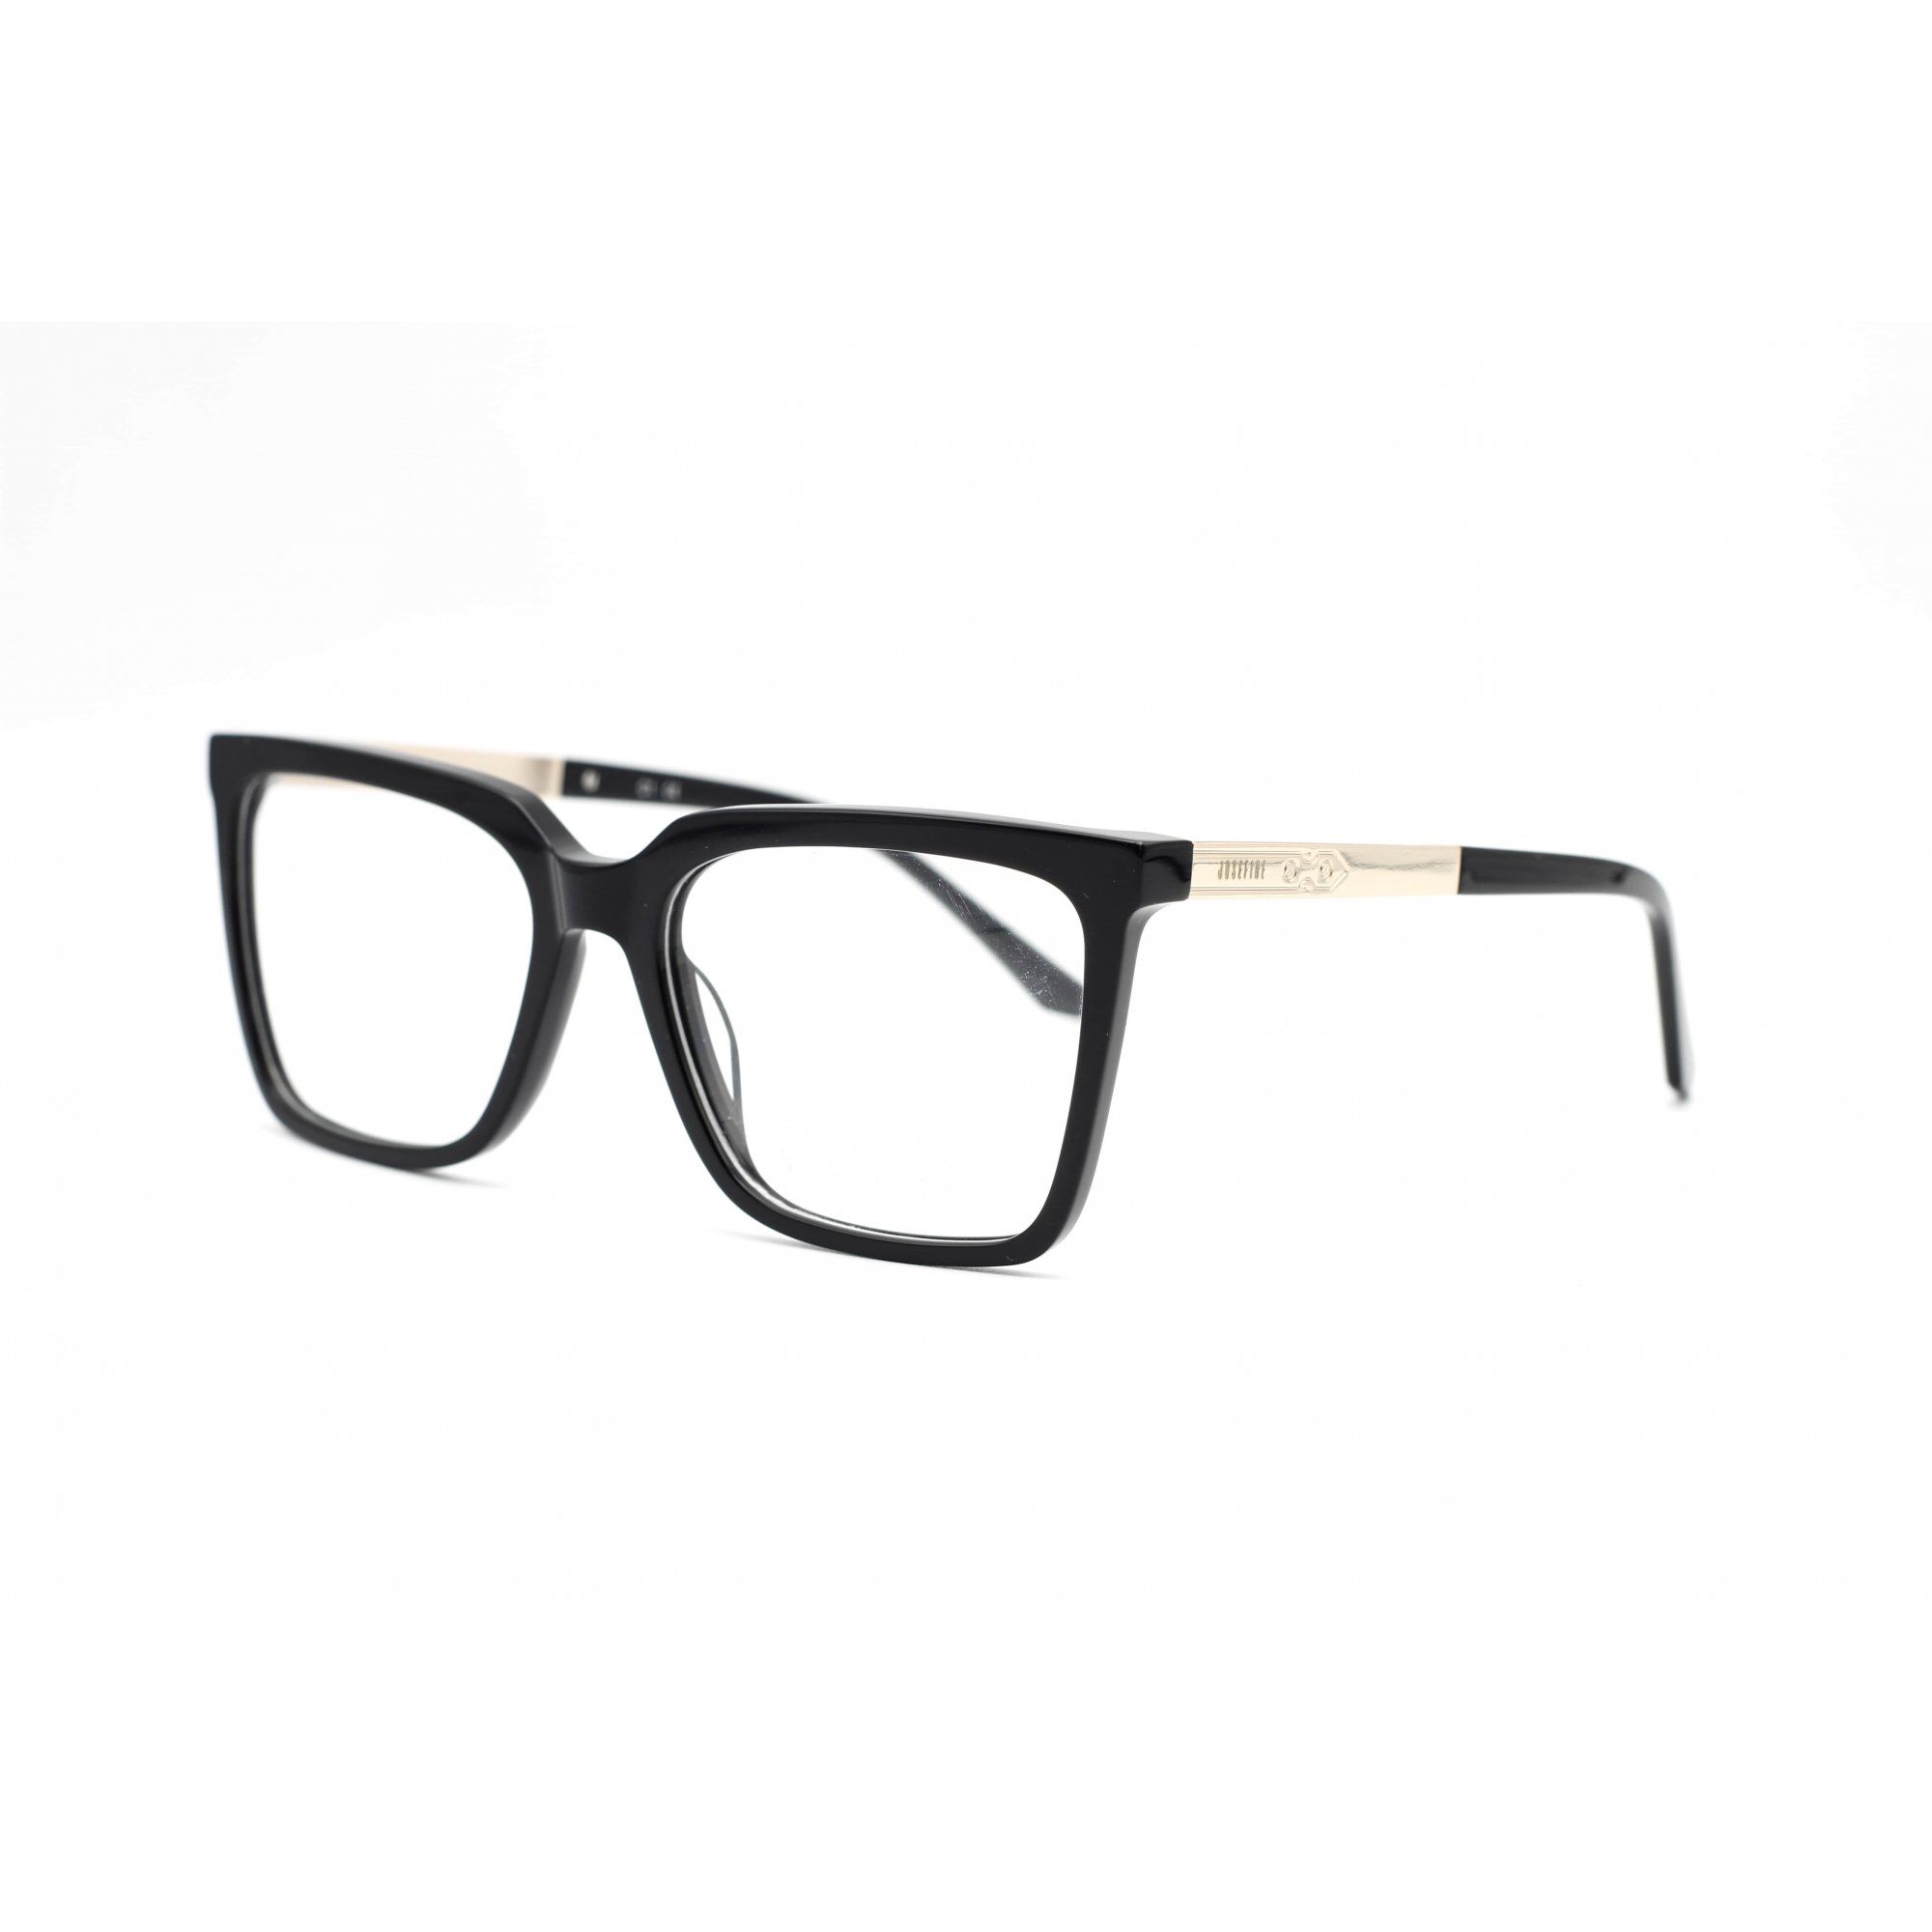 Armação para óculos Josefine MB4668 C1 55